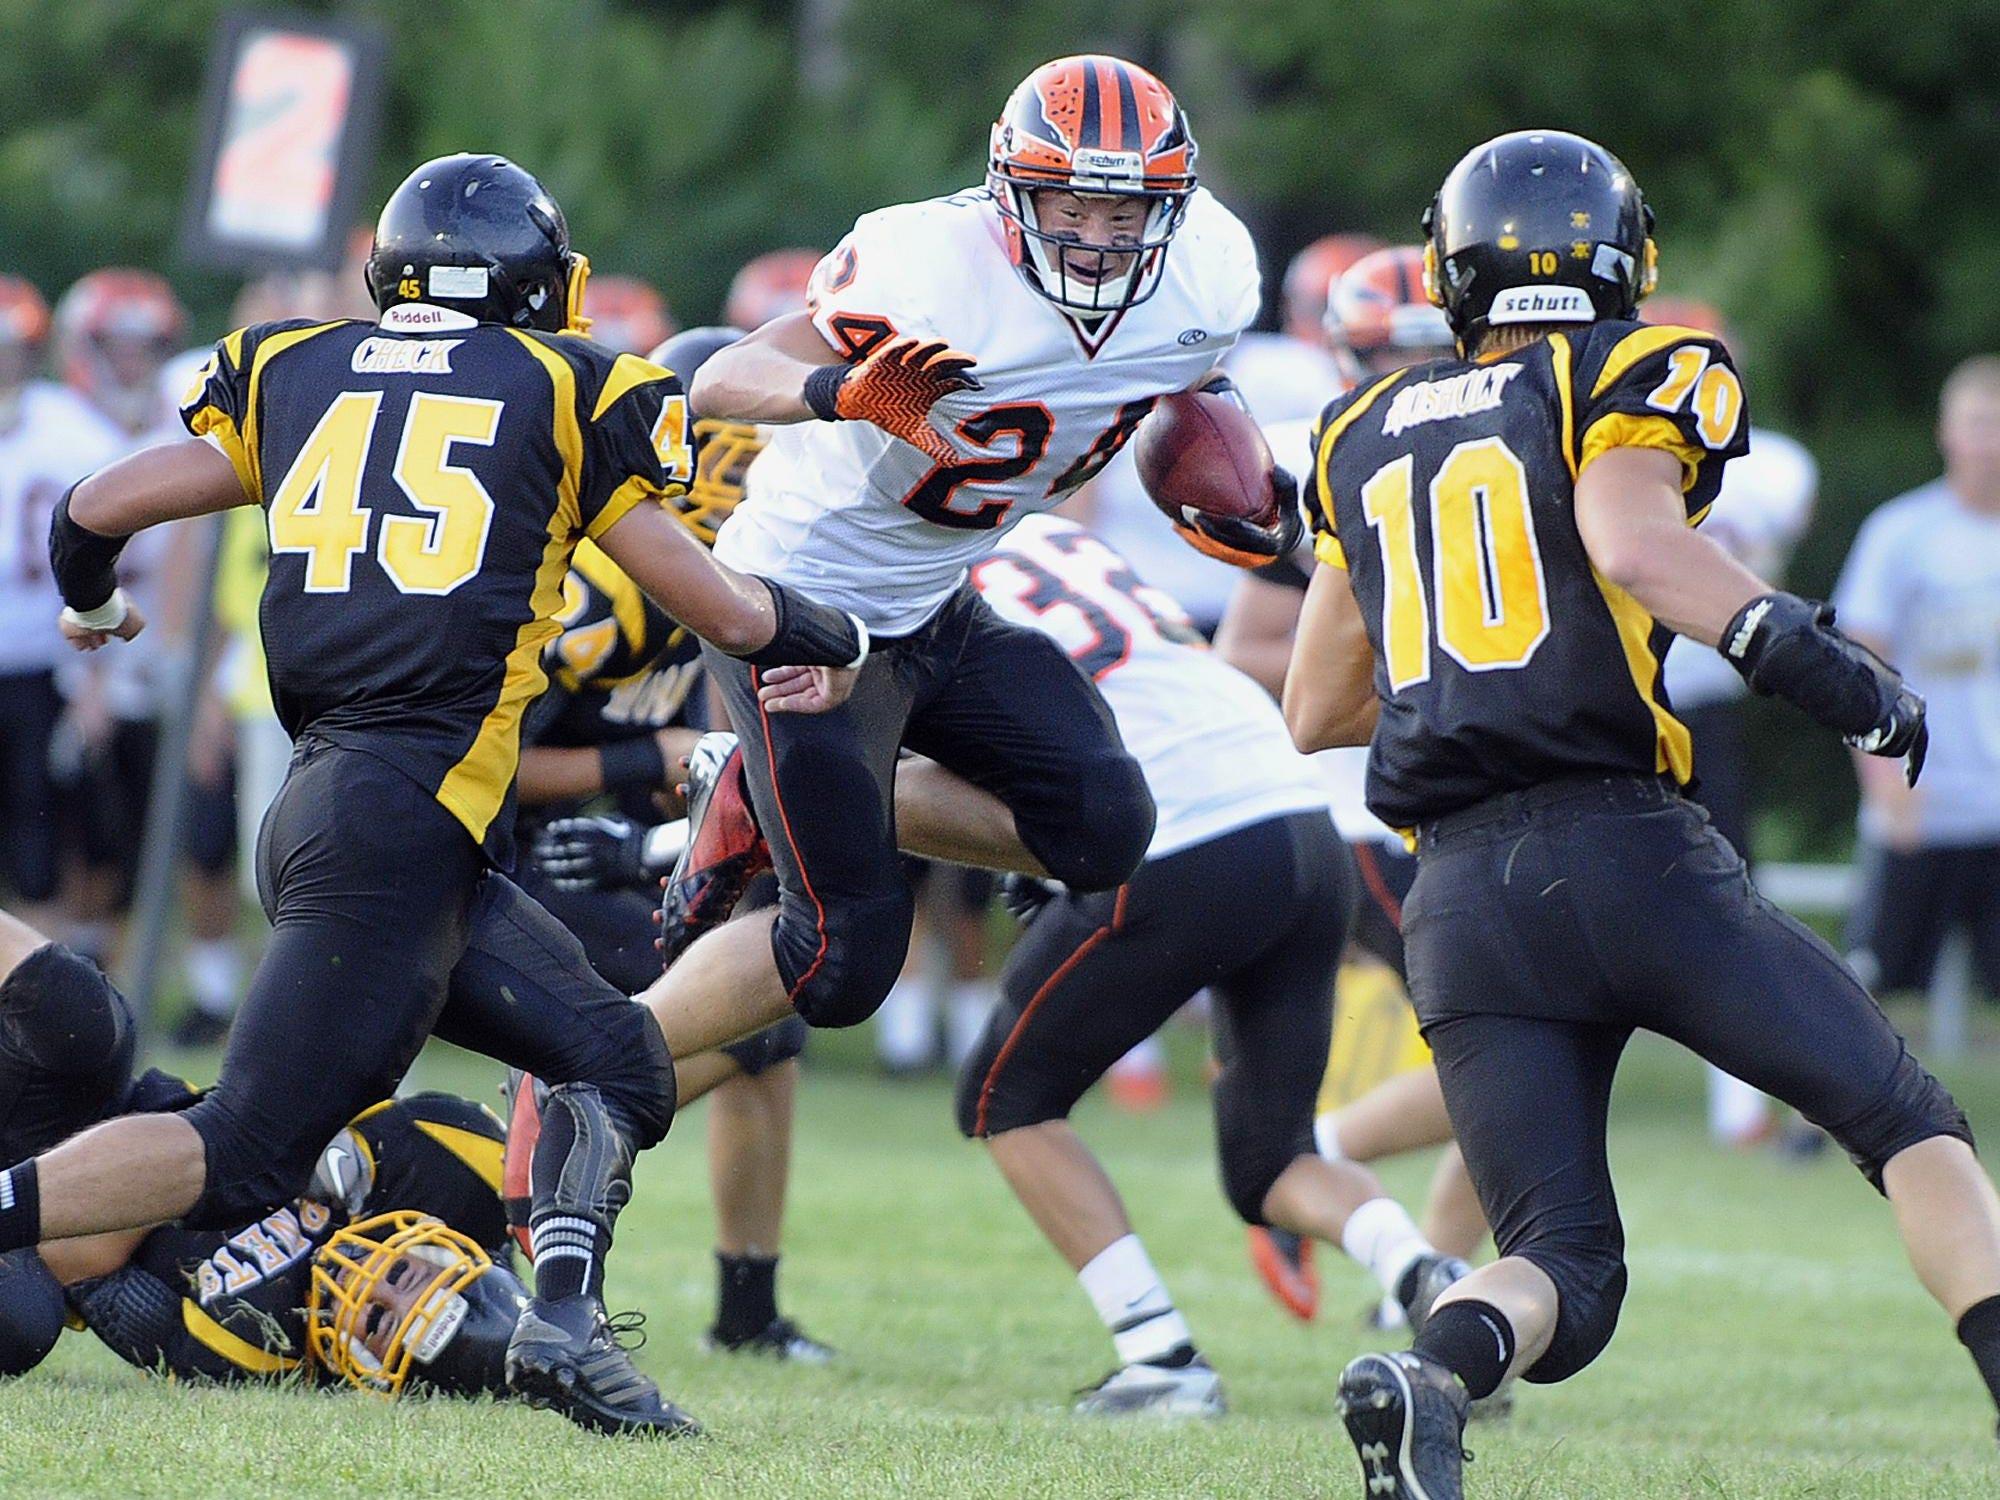 Iola-Scandinavia's Kristian Welch, center, will play football at the University of Iowa.